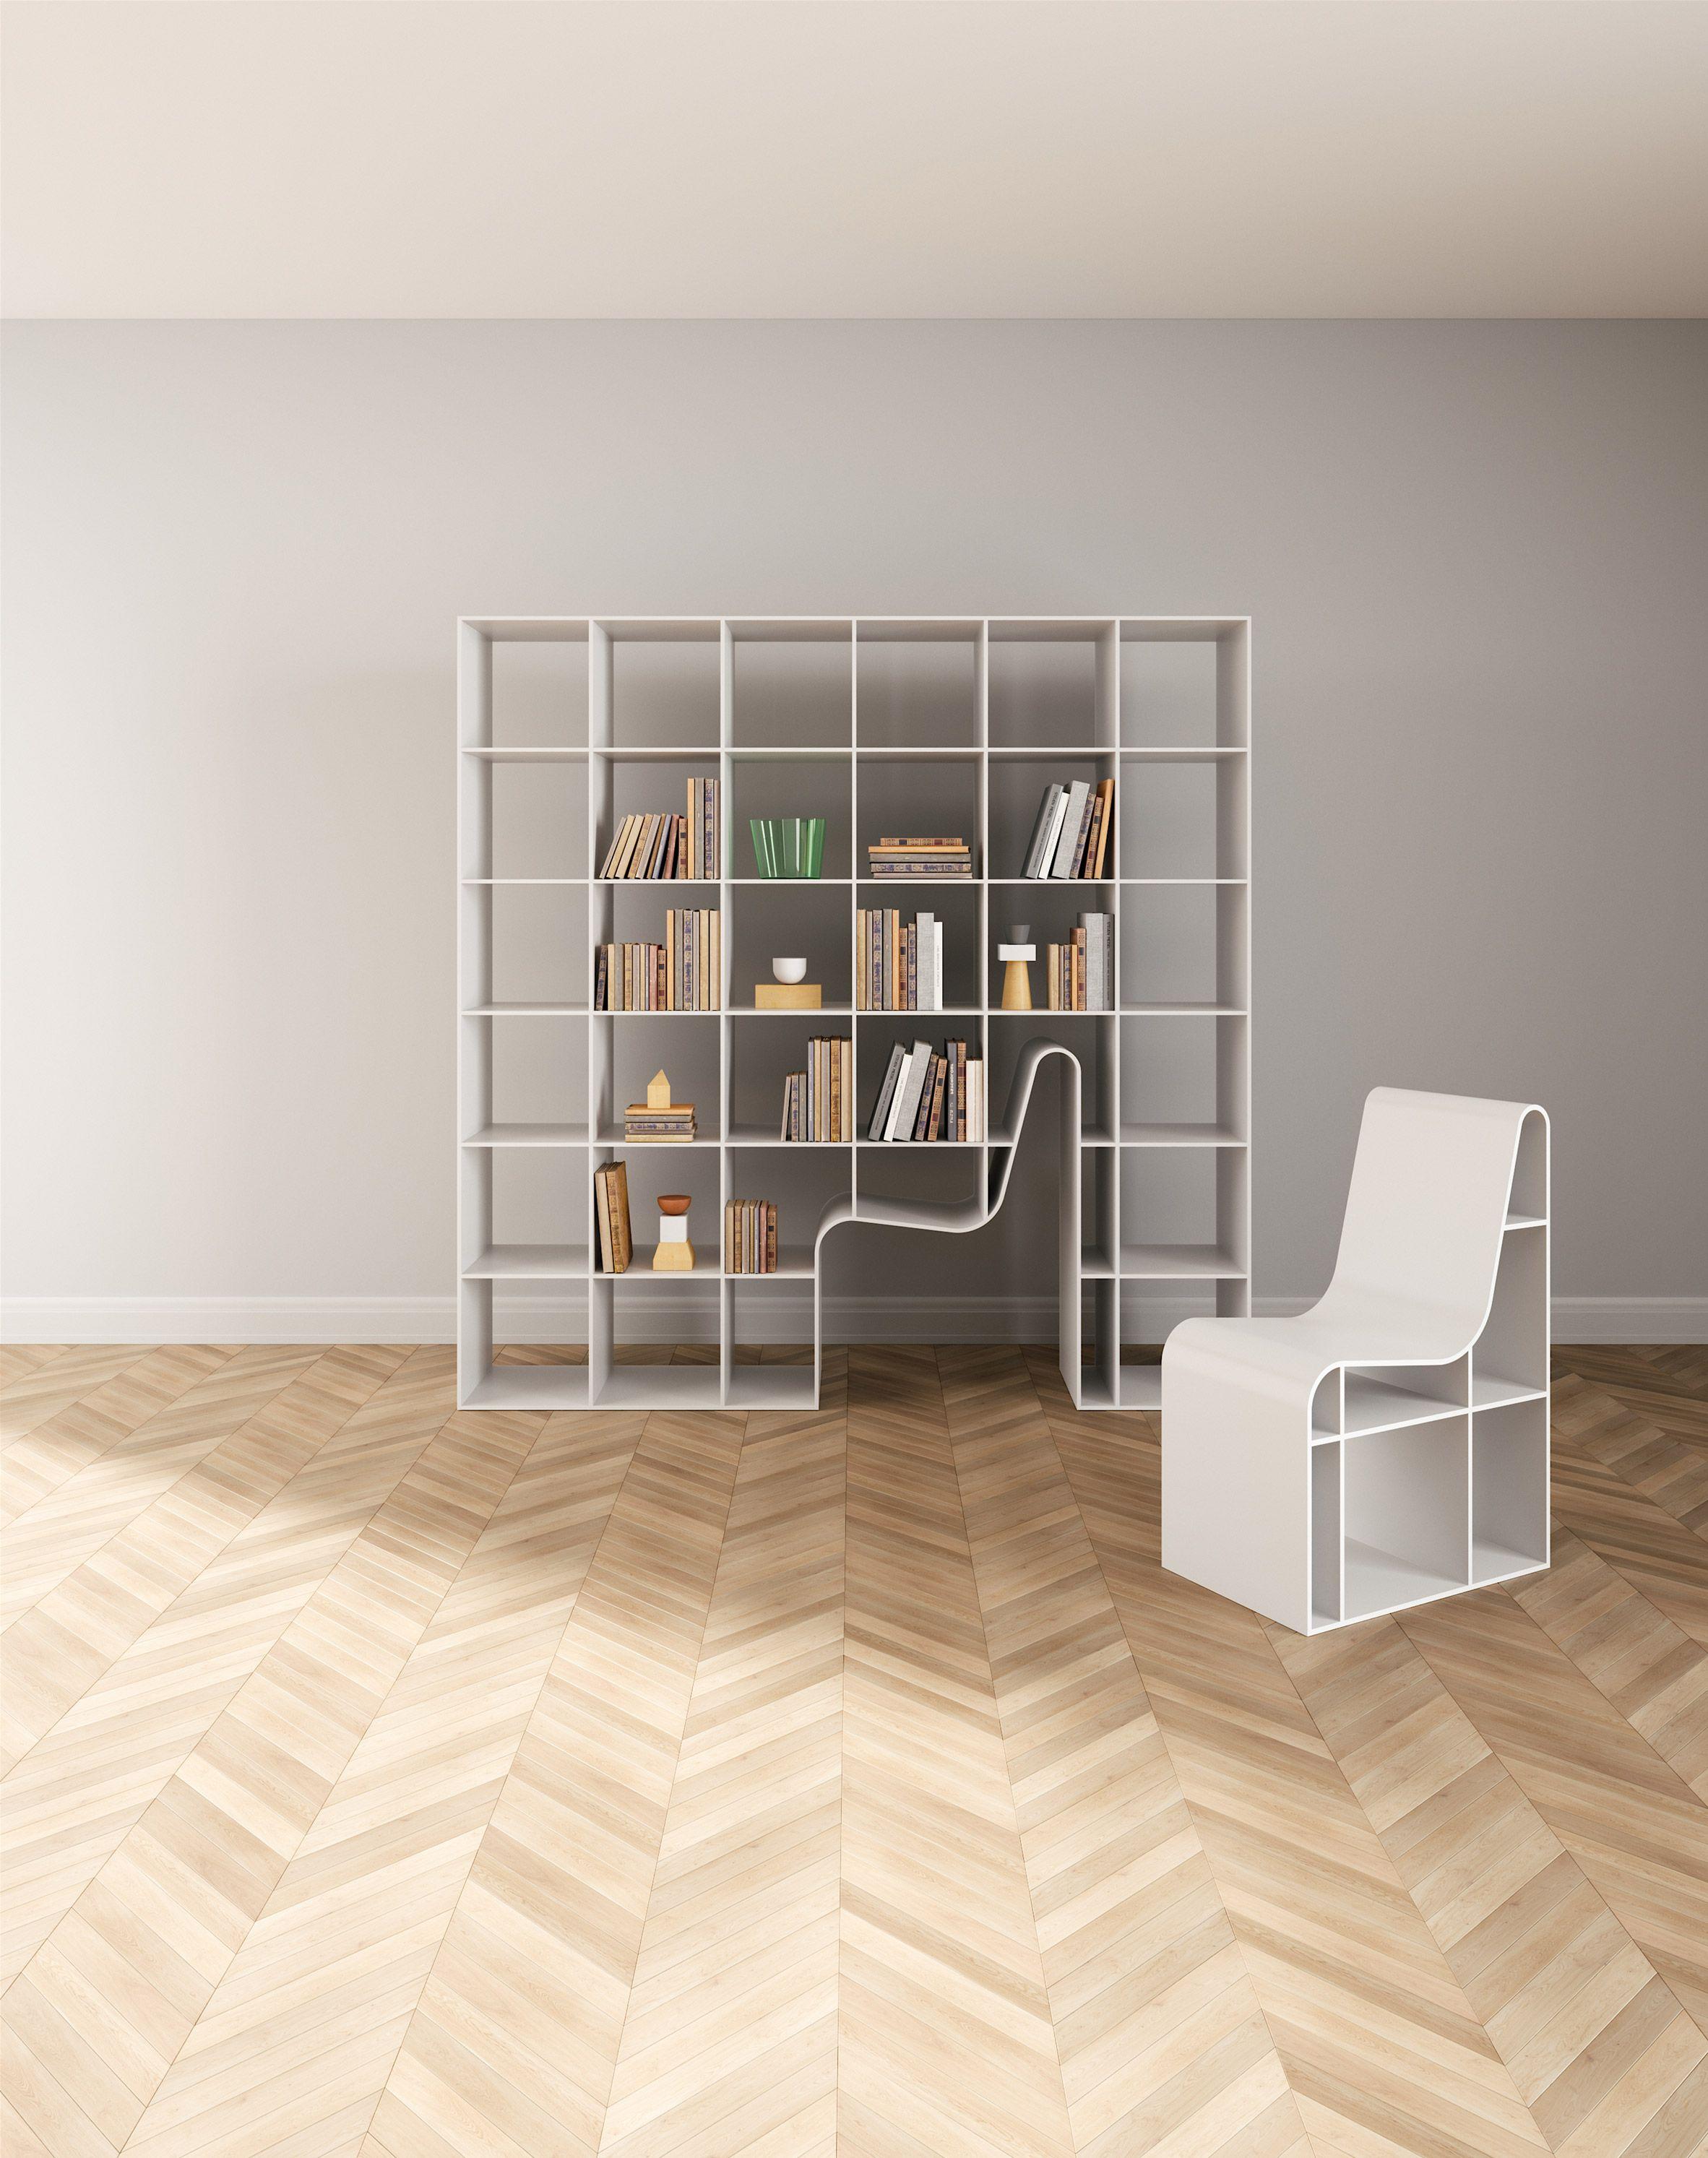 Bookchair by sou fujimoto furniture muebles dise o de muebles y dise o industrial - Muebles diseno industrial ...